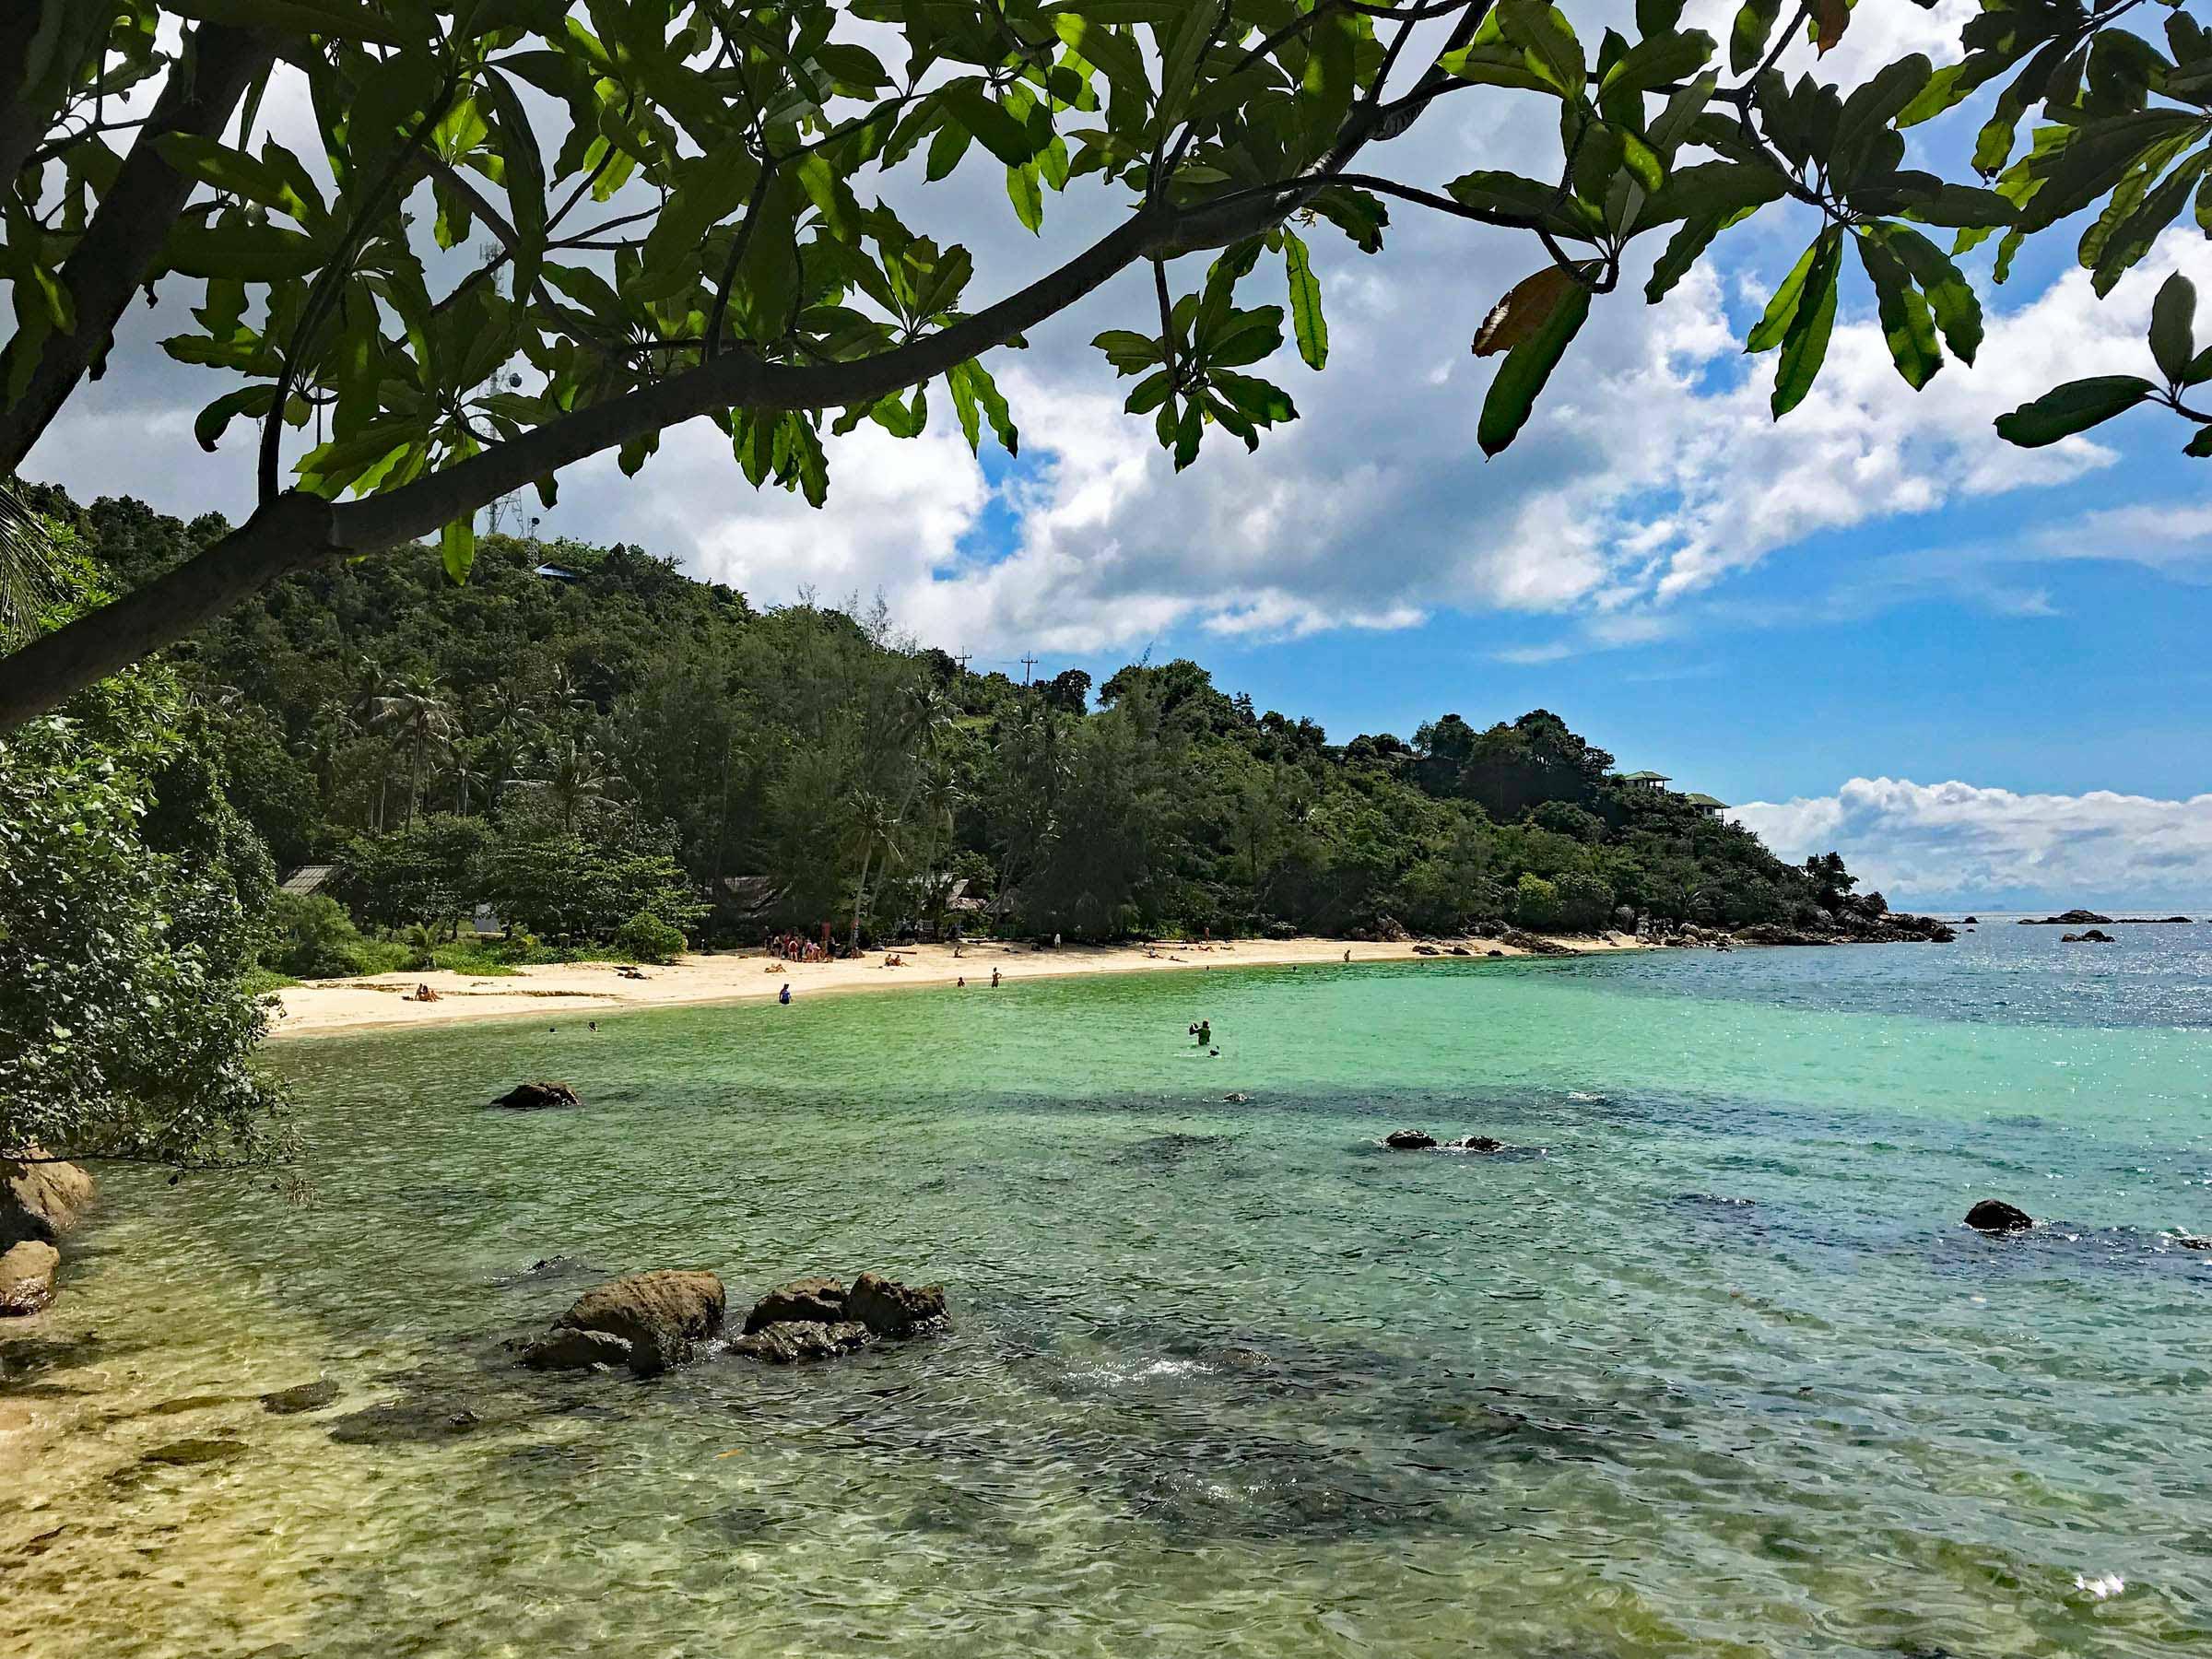 thailand koh phangan haad son secret beach bucht strand schnorcheln flashpacker travelguide. Black Bedroom Furniture Sets. Home Design Ideas